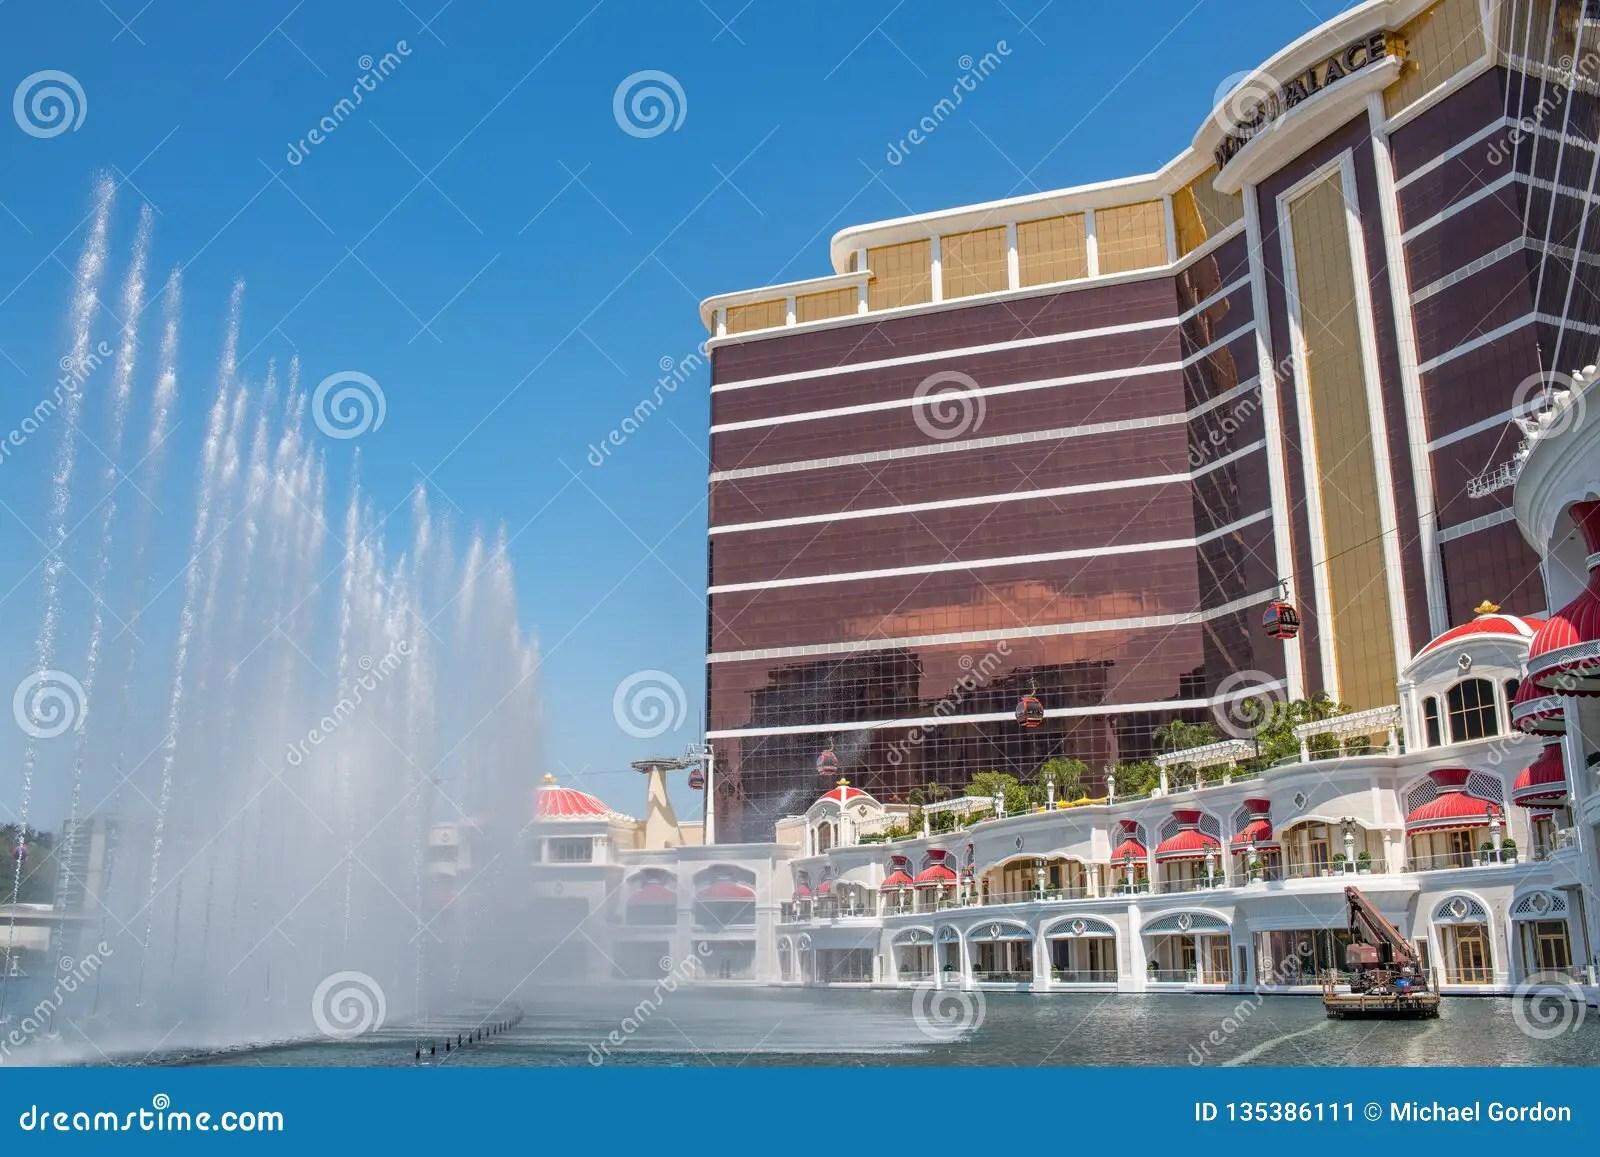 Wynn Palace In Cotai. Macau Editorial Photo - Image of asian. administrative: 135386111